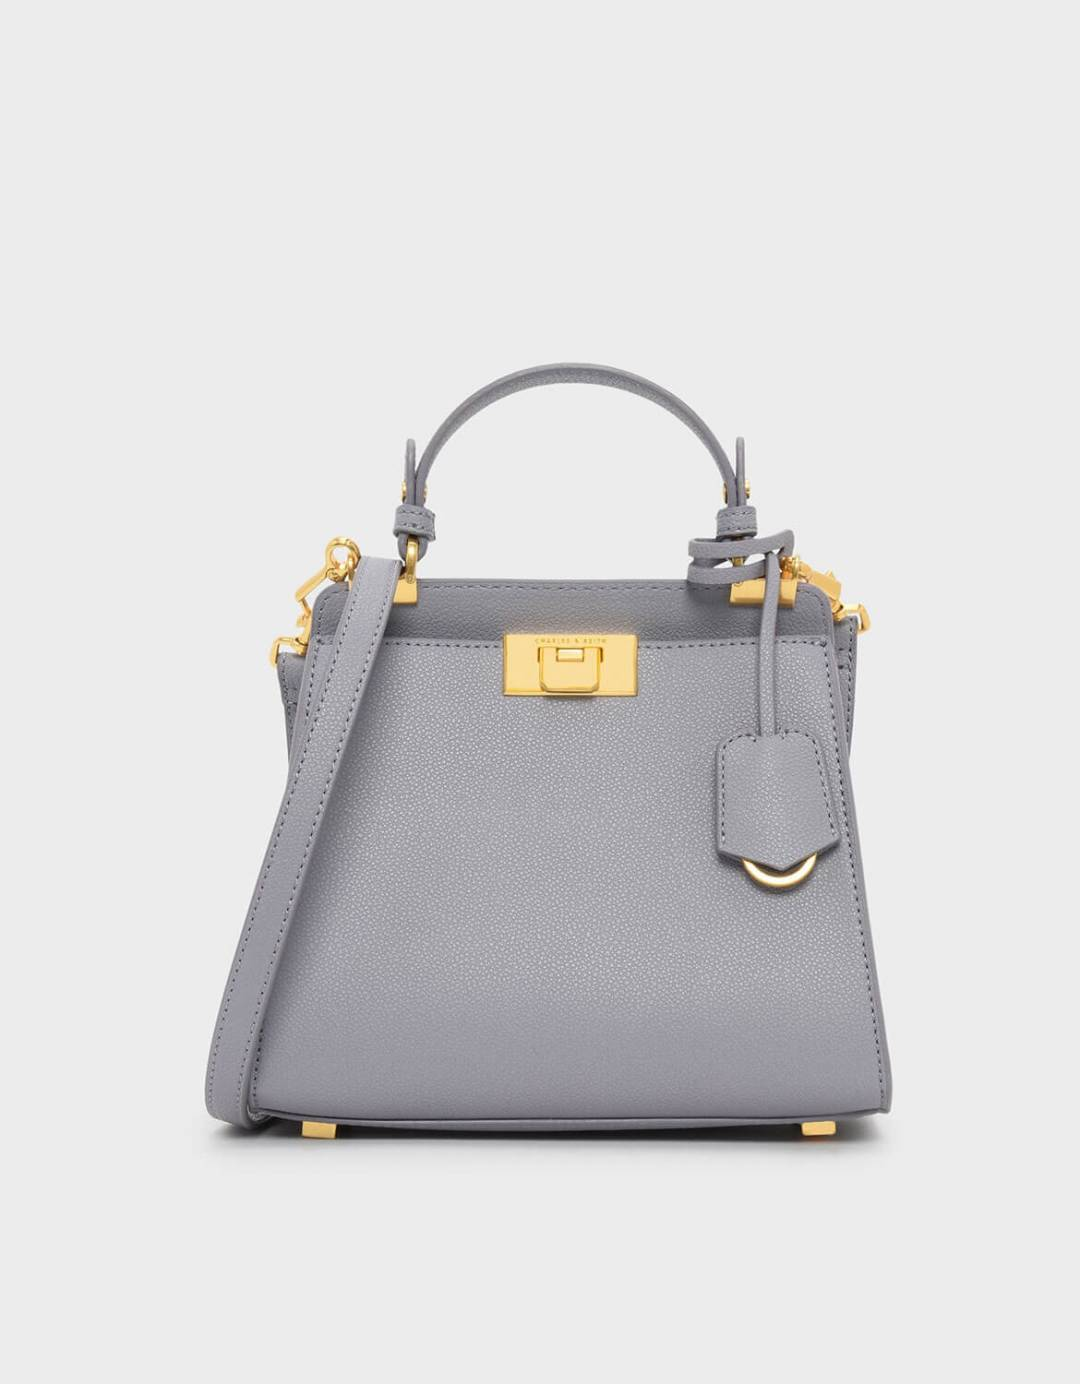 Classic Push-Lock Bag on ShopperBoard 770d1ac8865f2